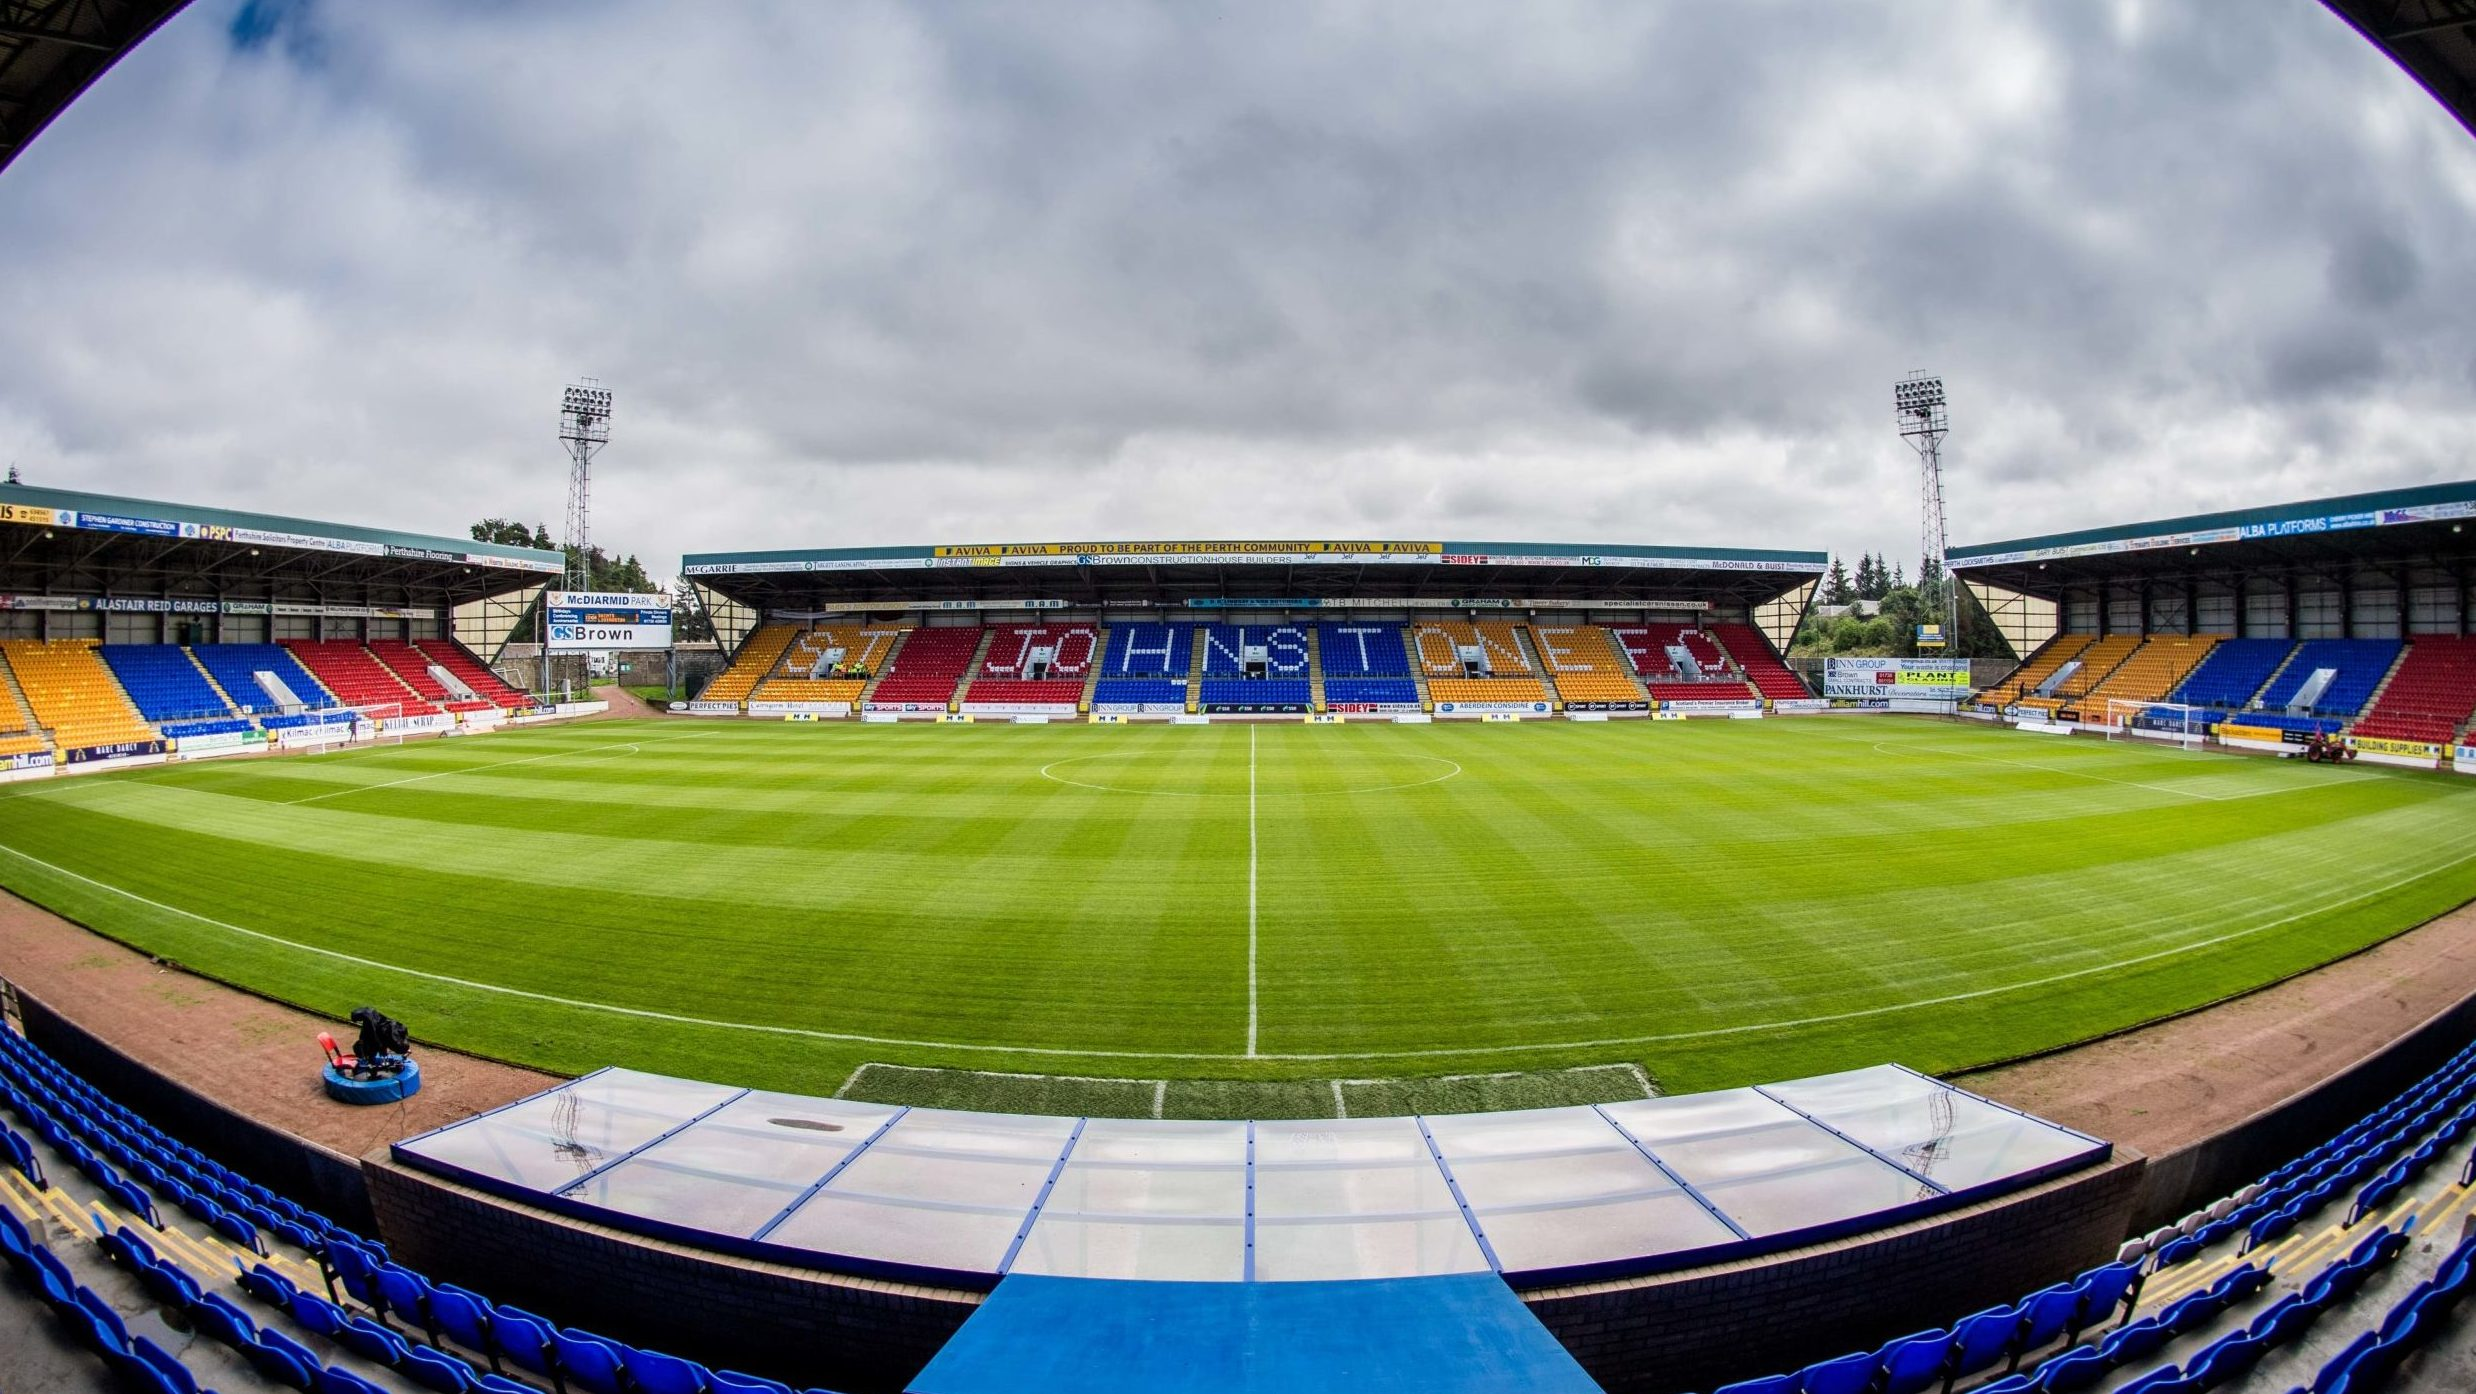 McDiarmid Park, home of St Johnstone FC.